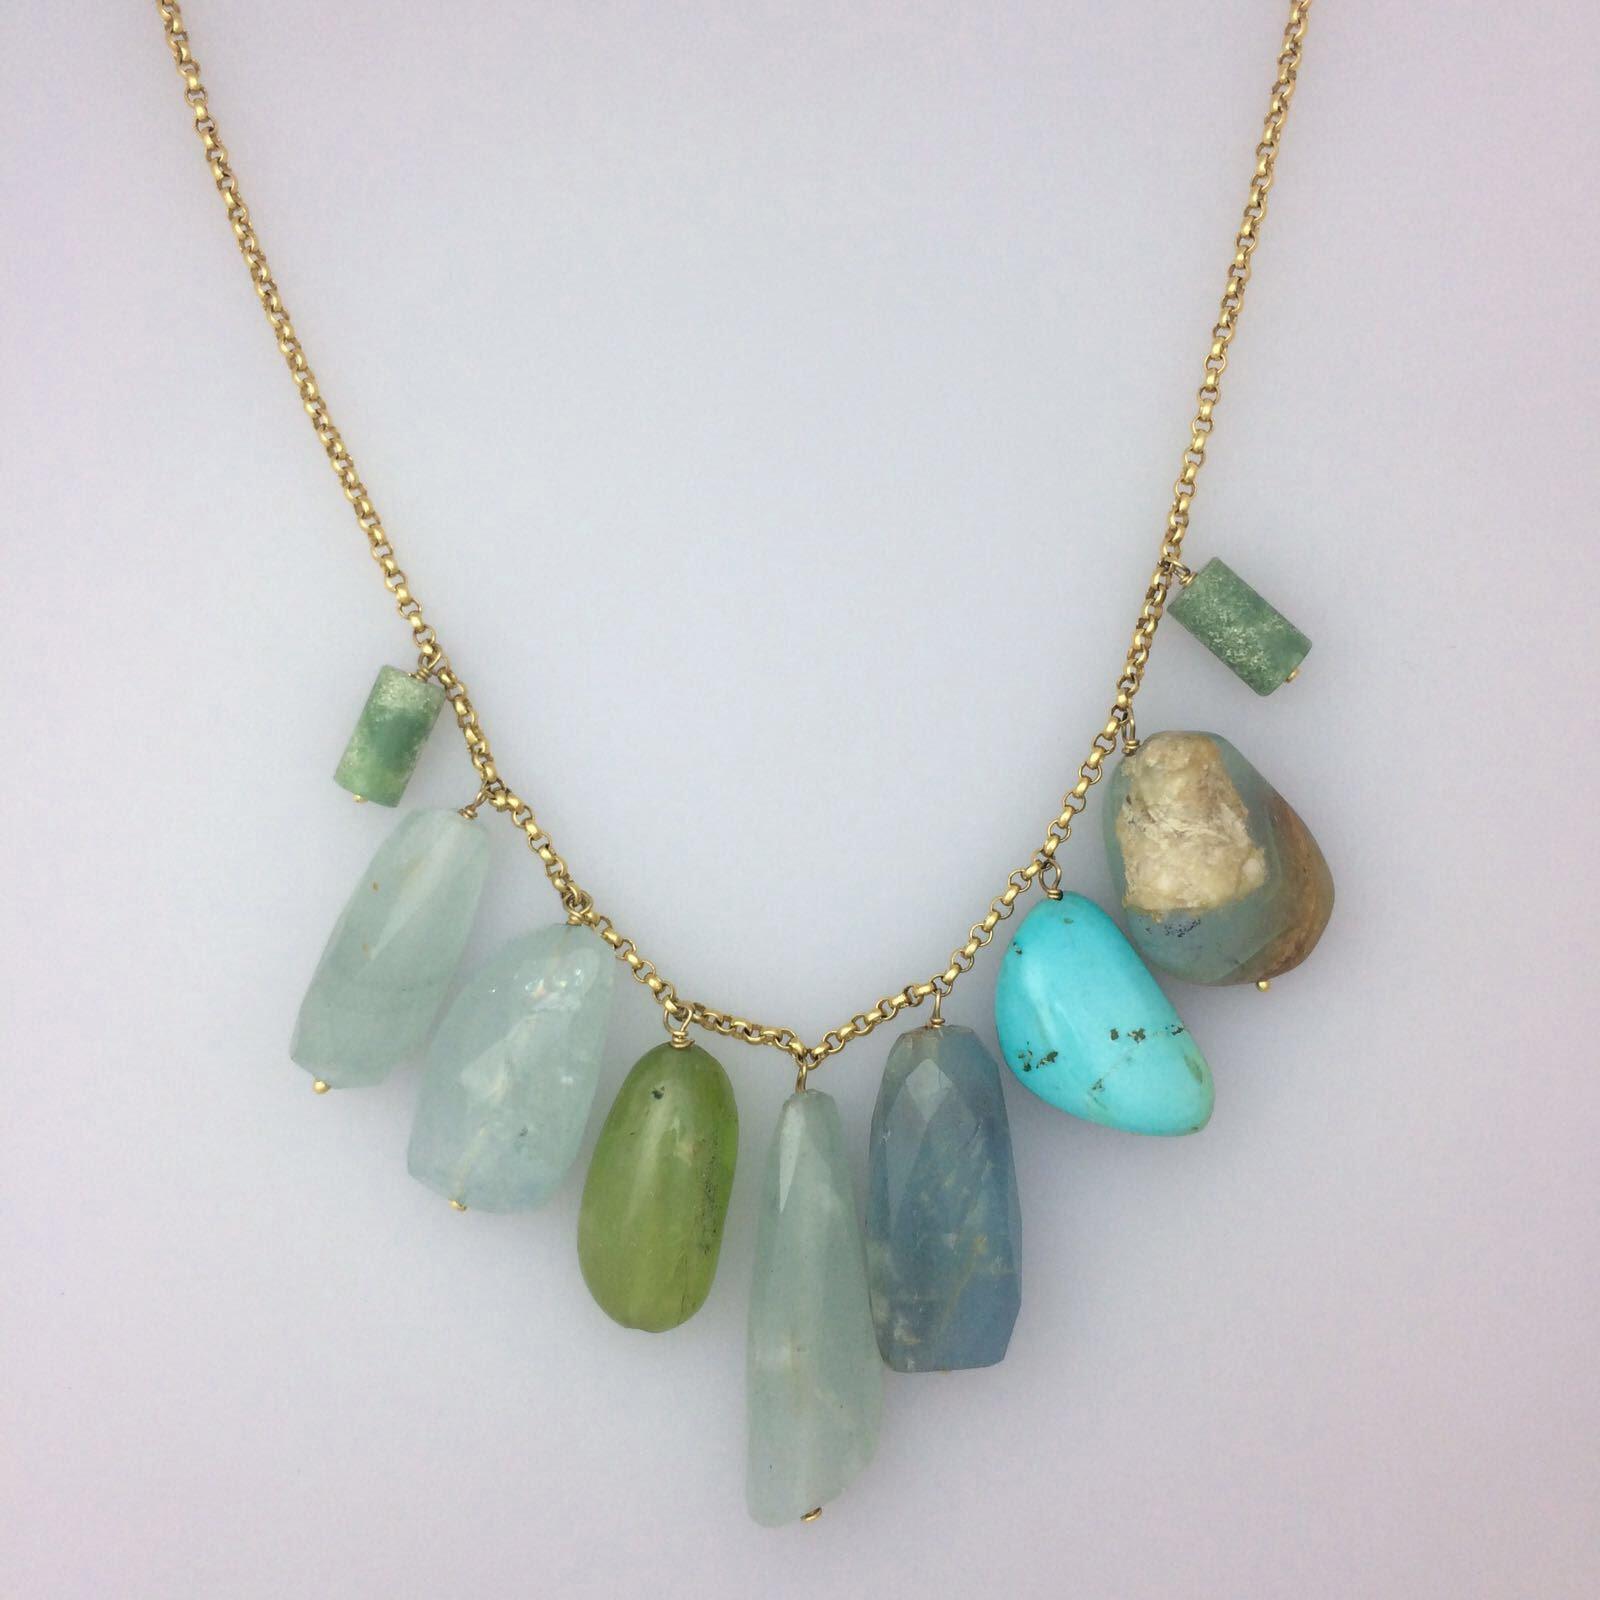 semi precious 18kt necklace